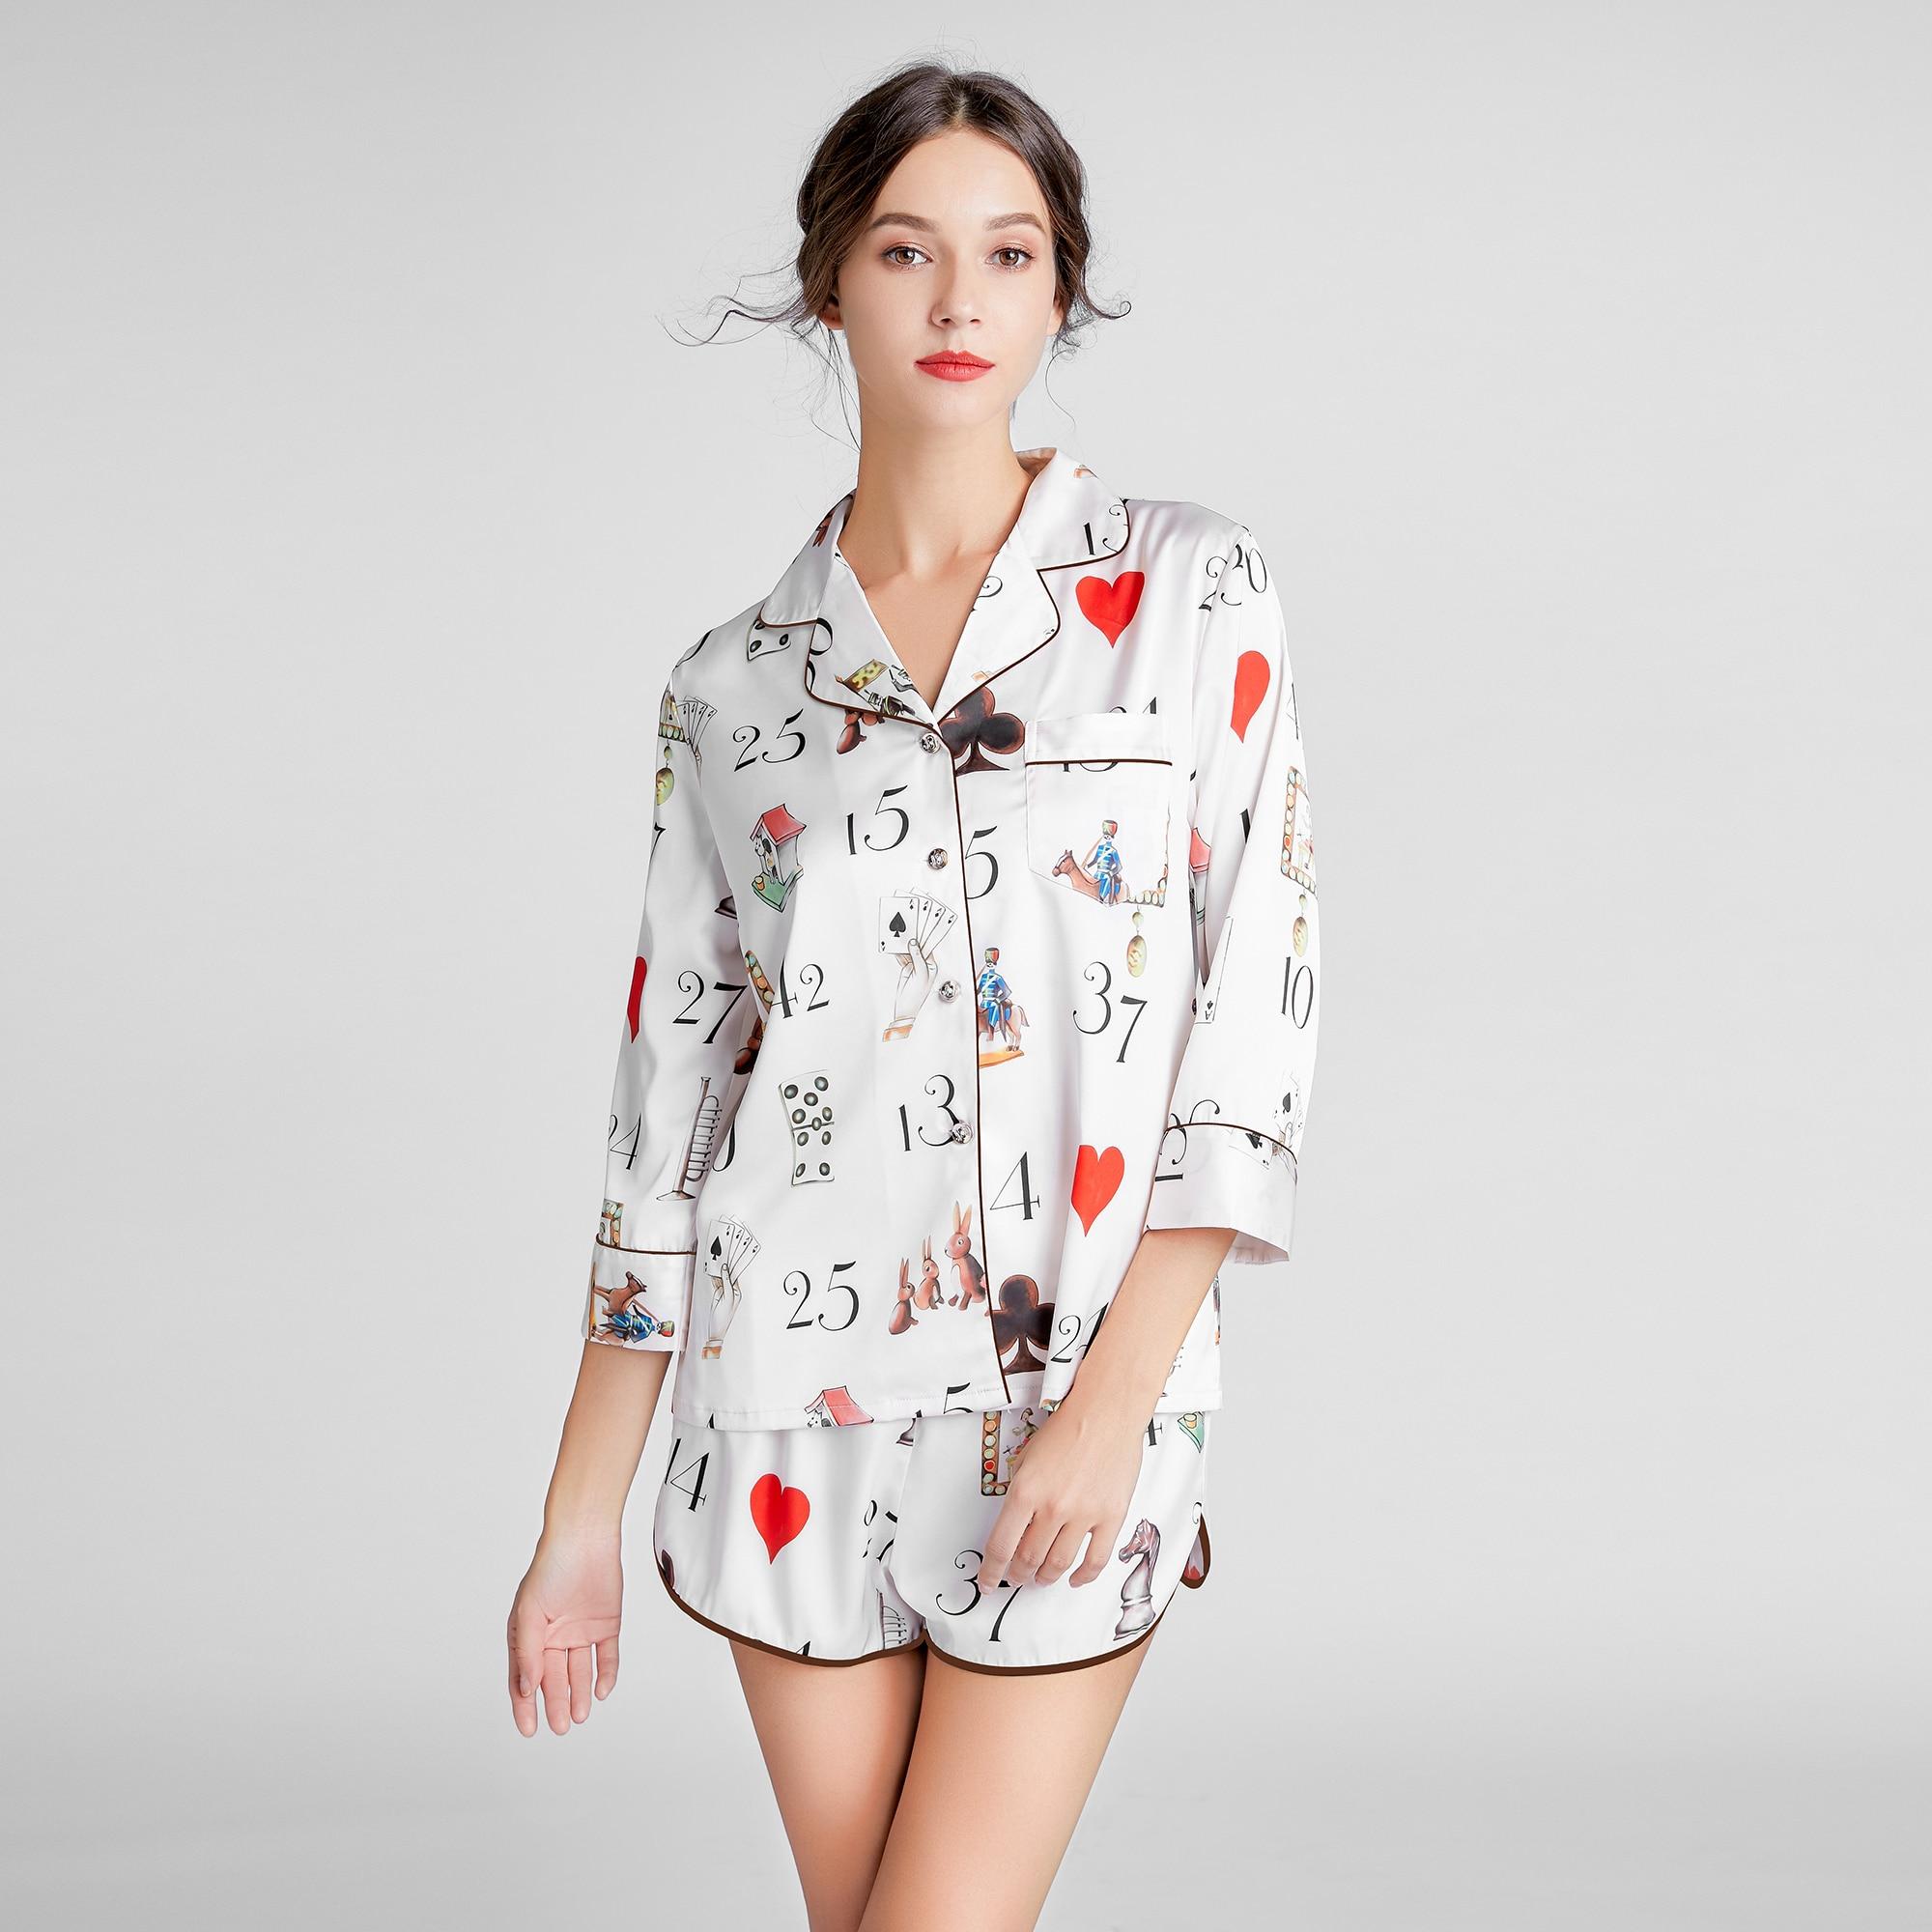 Summer Sexy Pajamas Women Cute Letter Print Pajama Sets Ladies Silk Satin Tops and Shorts Pyjama Woman Nightwear Sleepwear Suits